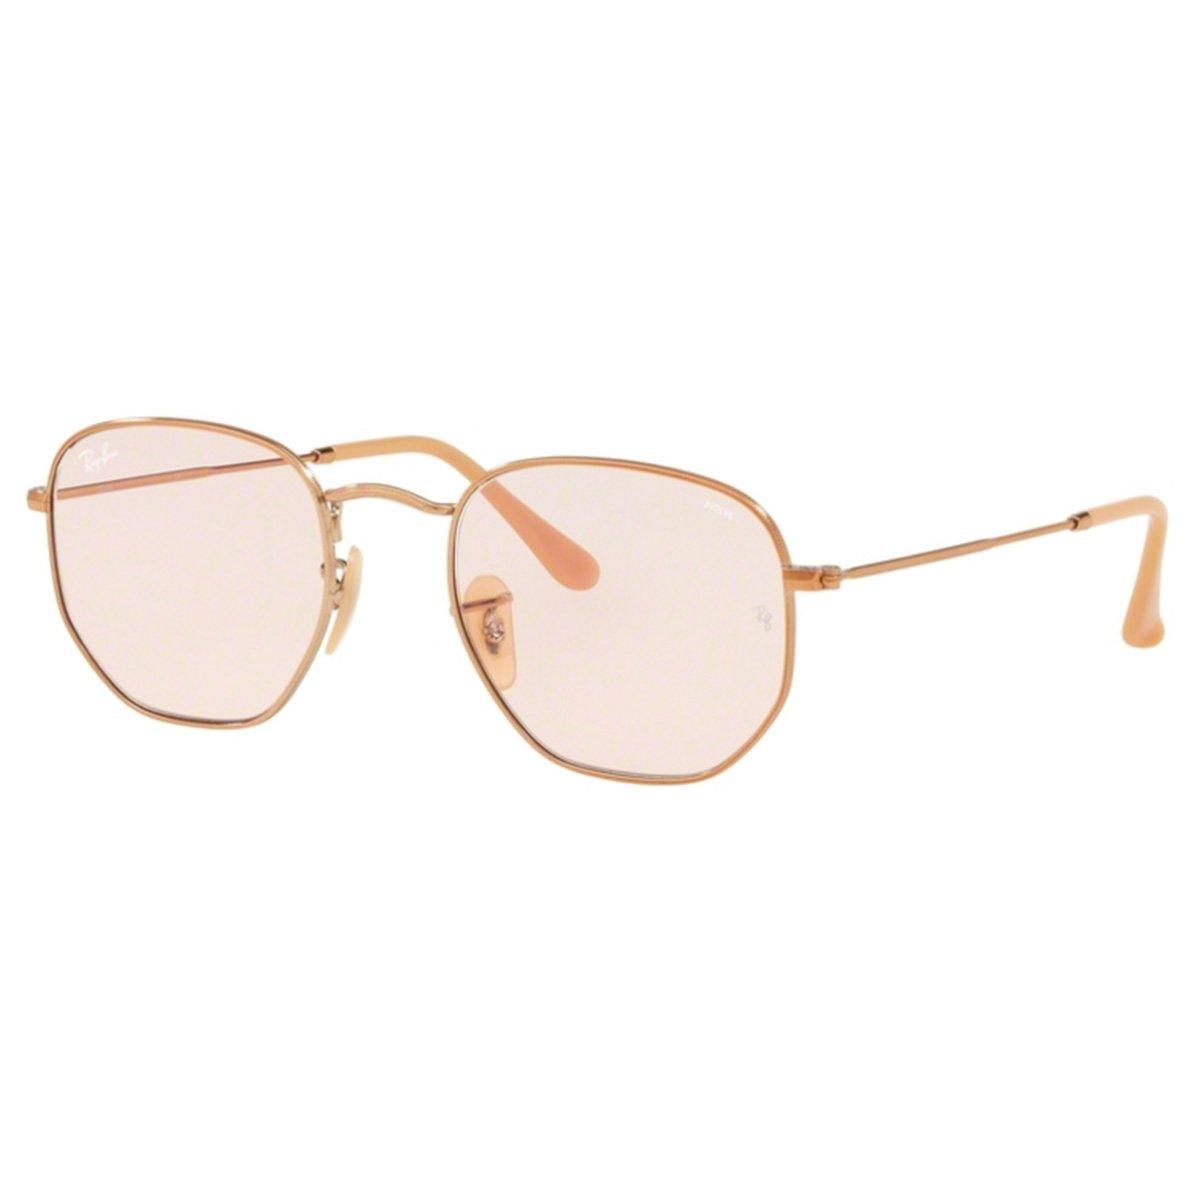 Compre Óculos de Sol Ray Ban Hexagonal OverSized em 10X   Tri-Jóia Shop e588d2b813a3